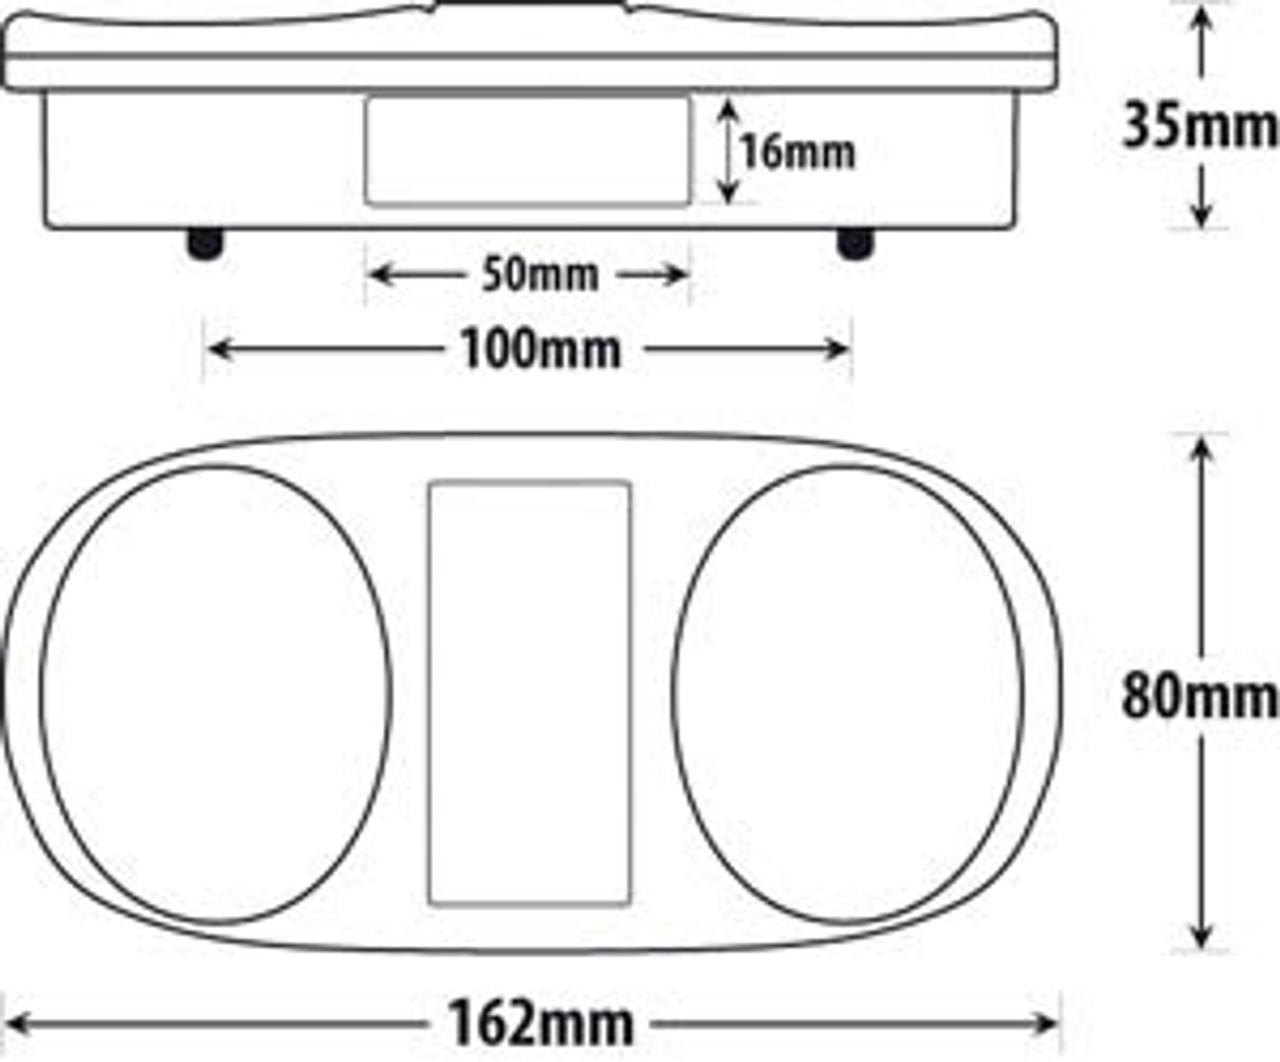 BR202 Series Line Drawing. Dimension - 162 x 80 x 35mm